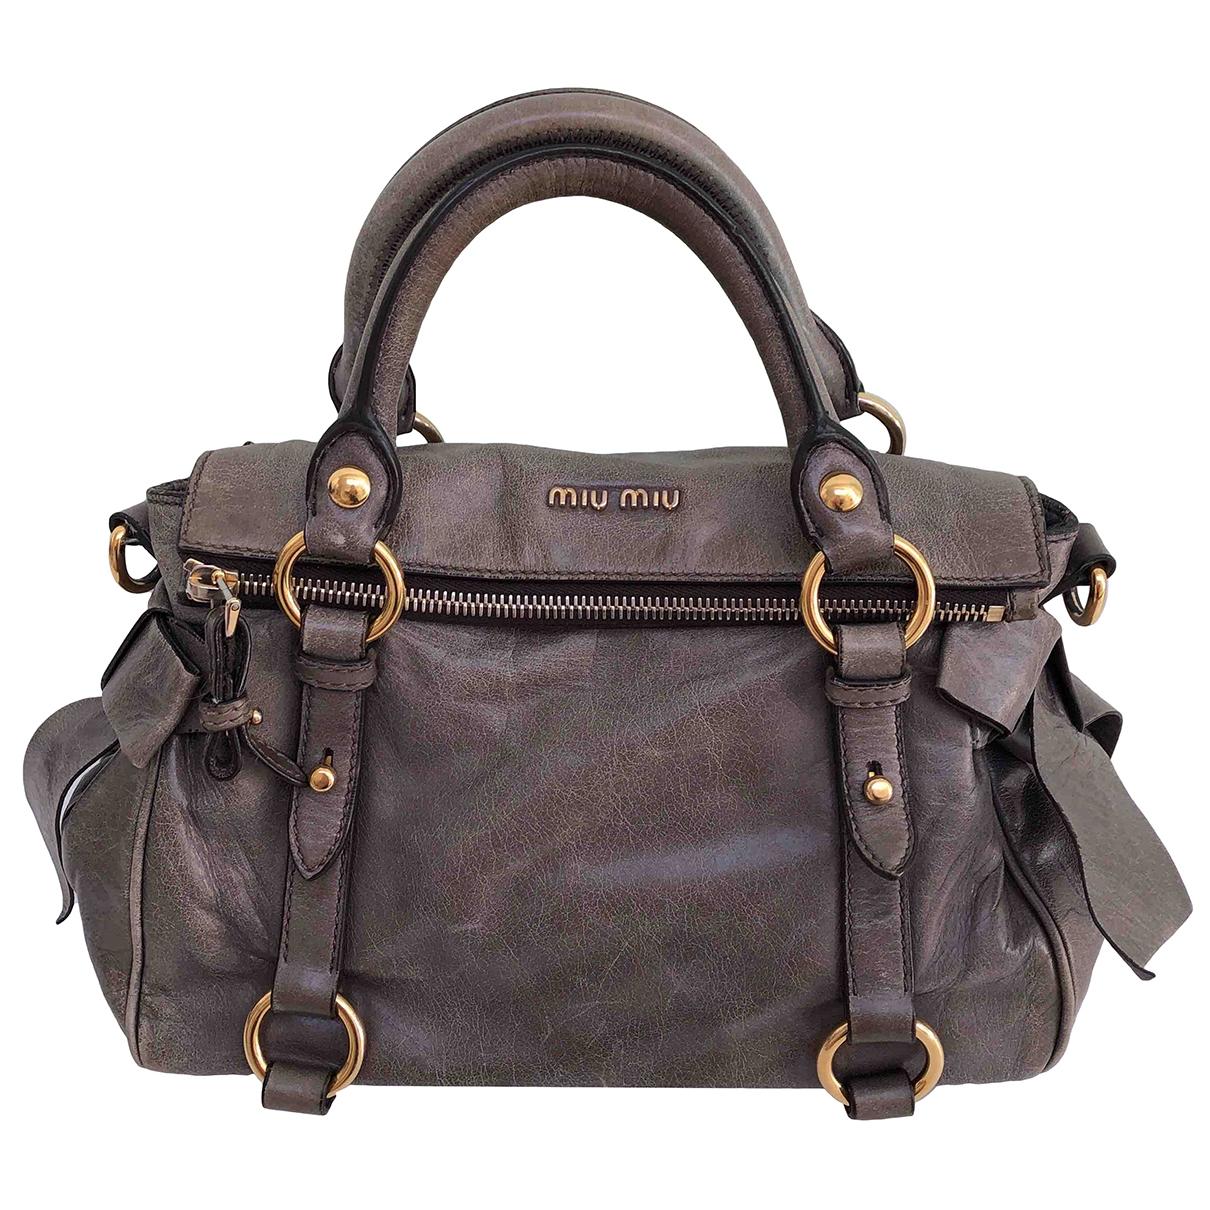 Miu Miu Bow bag Brown Leather handbag for Women \N